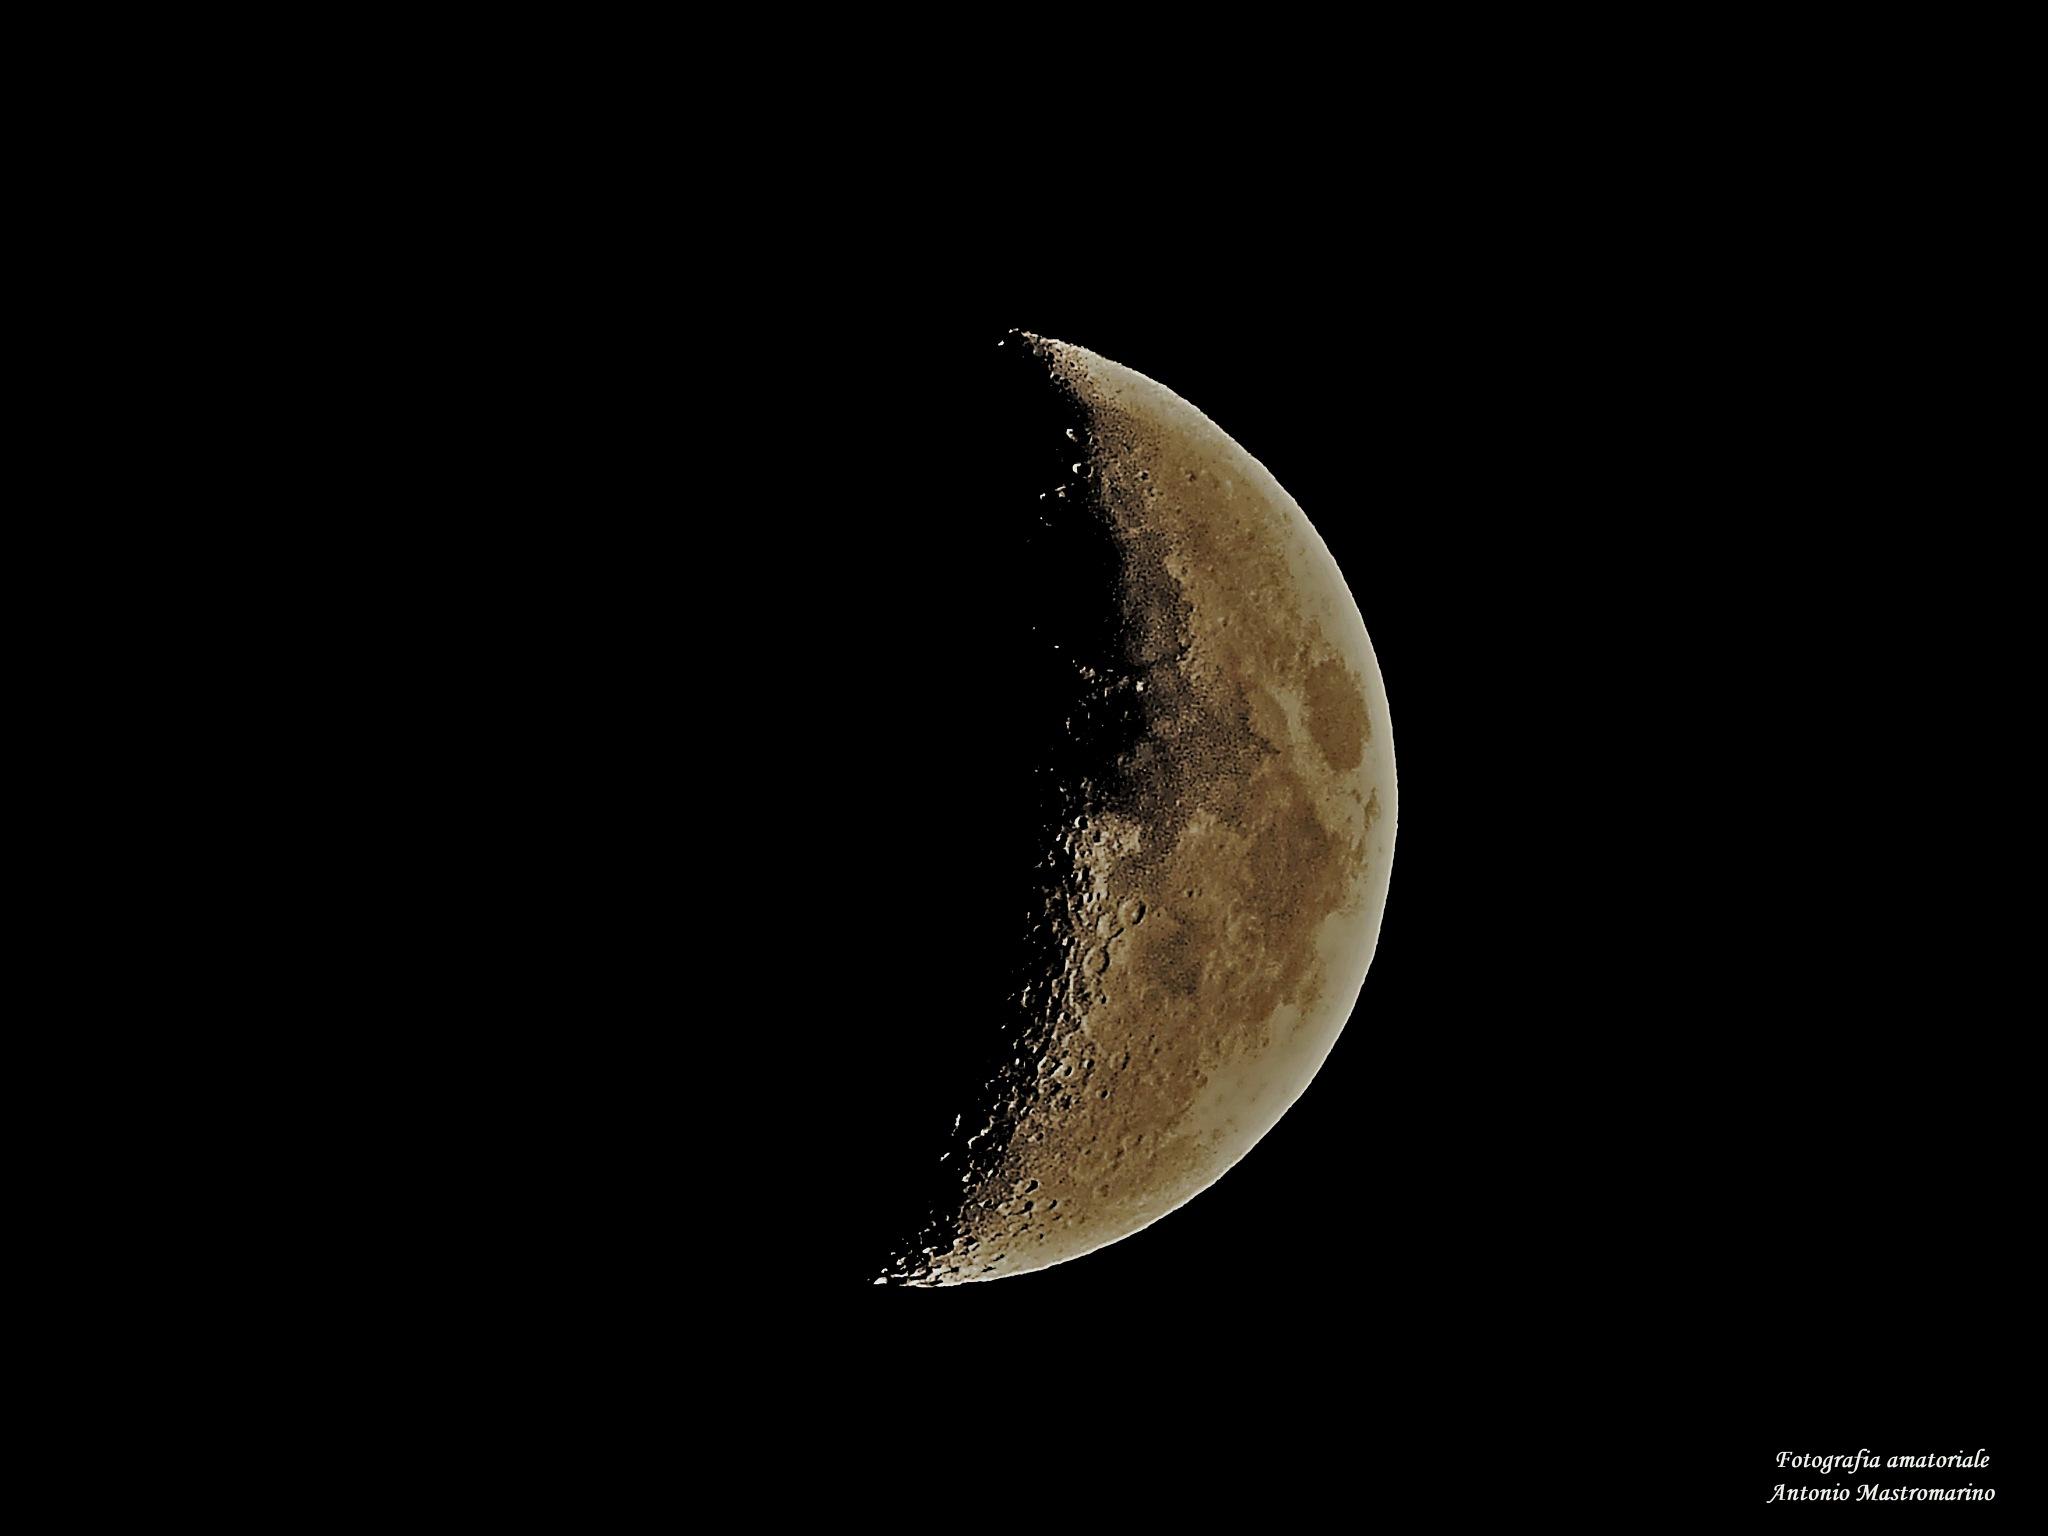 Luna Moon 26.10.2017 by antonio mastromarino